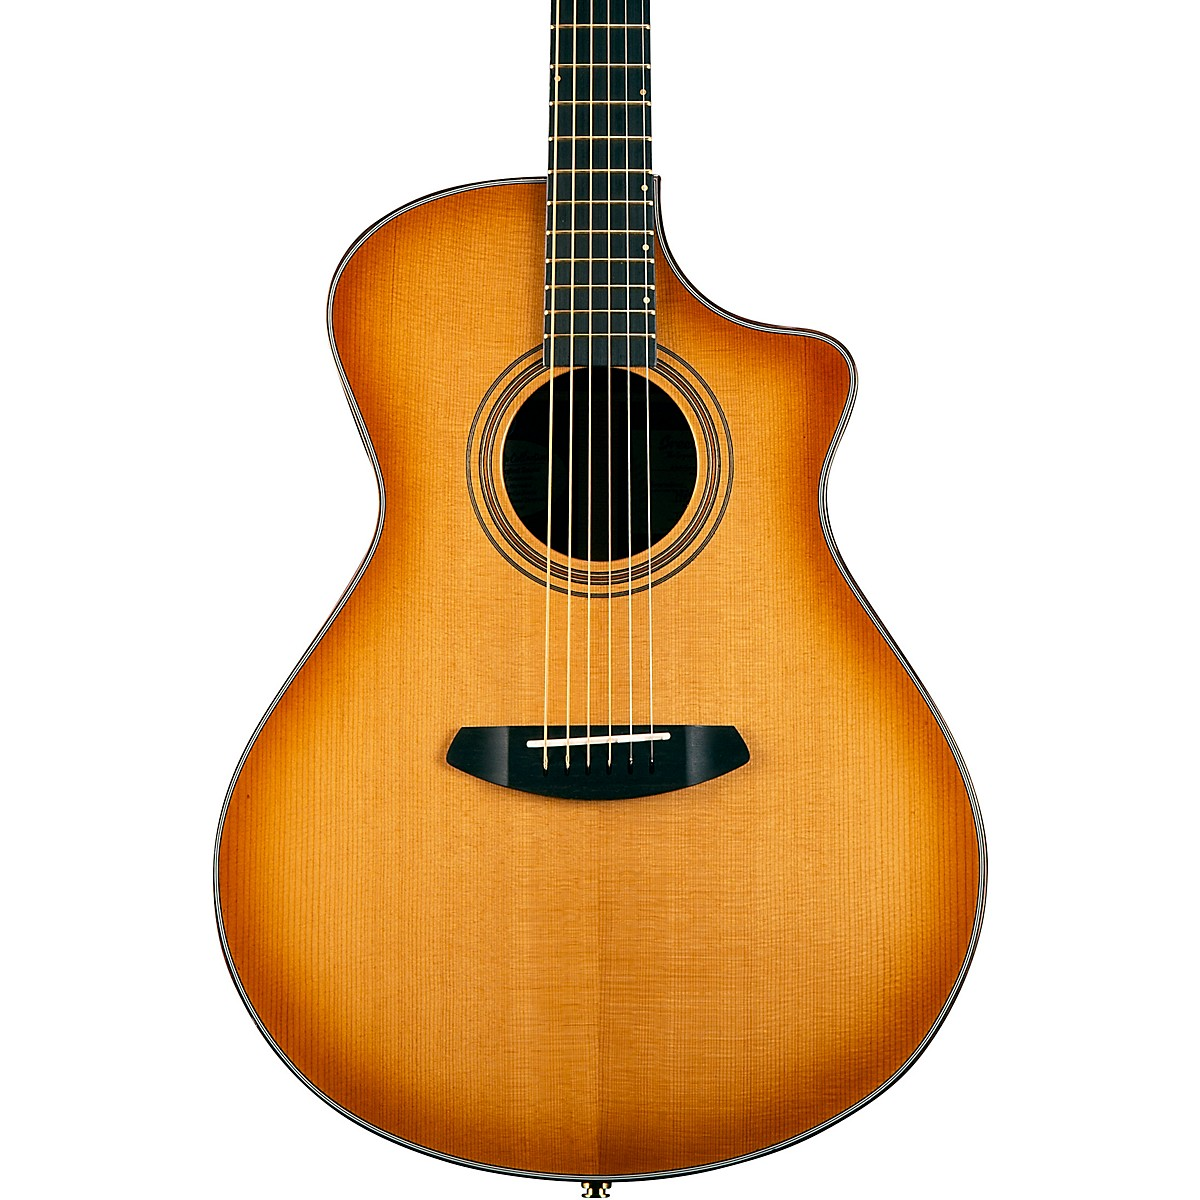 Breedlove Organic Collection Artista Granadillo Concert Cutaway CE Acoustic-Electric Guitar